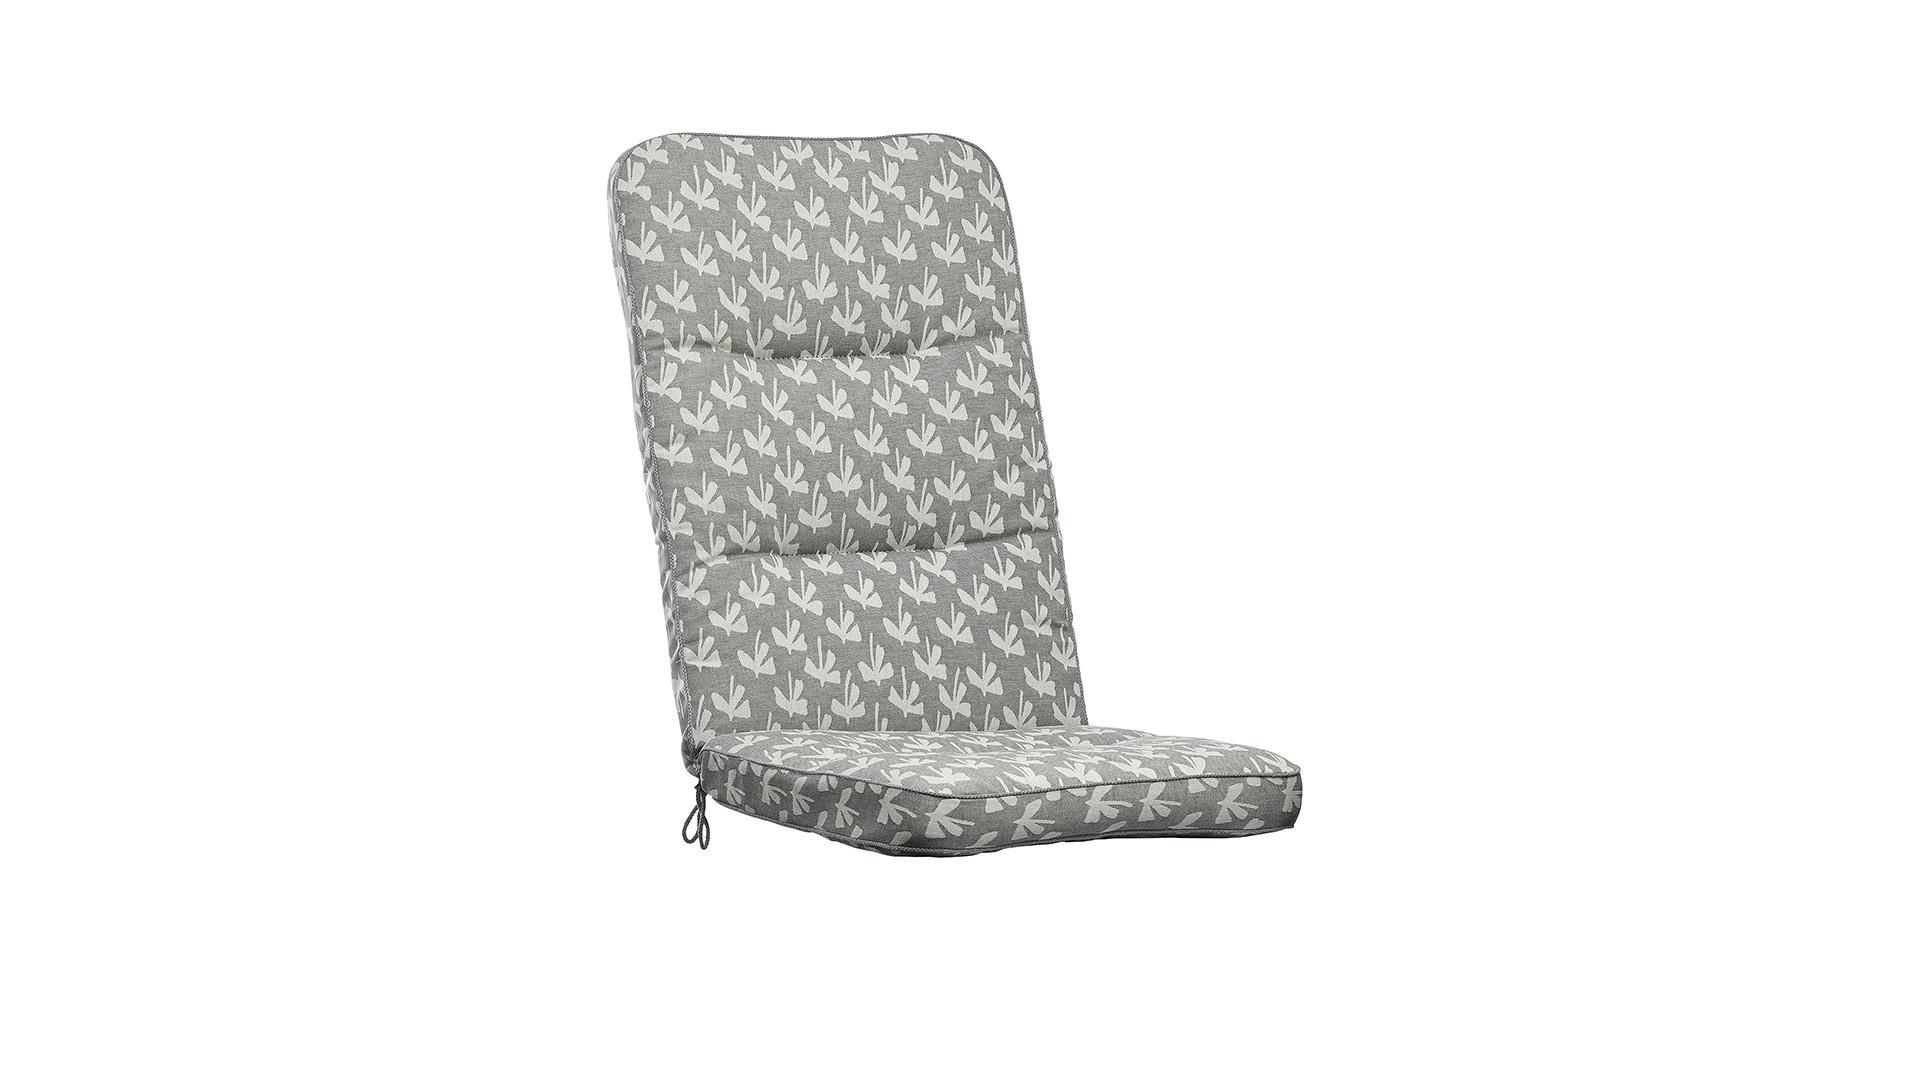 TASTE Sesselauflage 120 x 50 x 9 cm